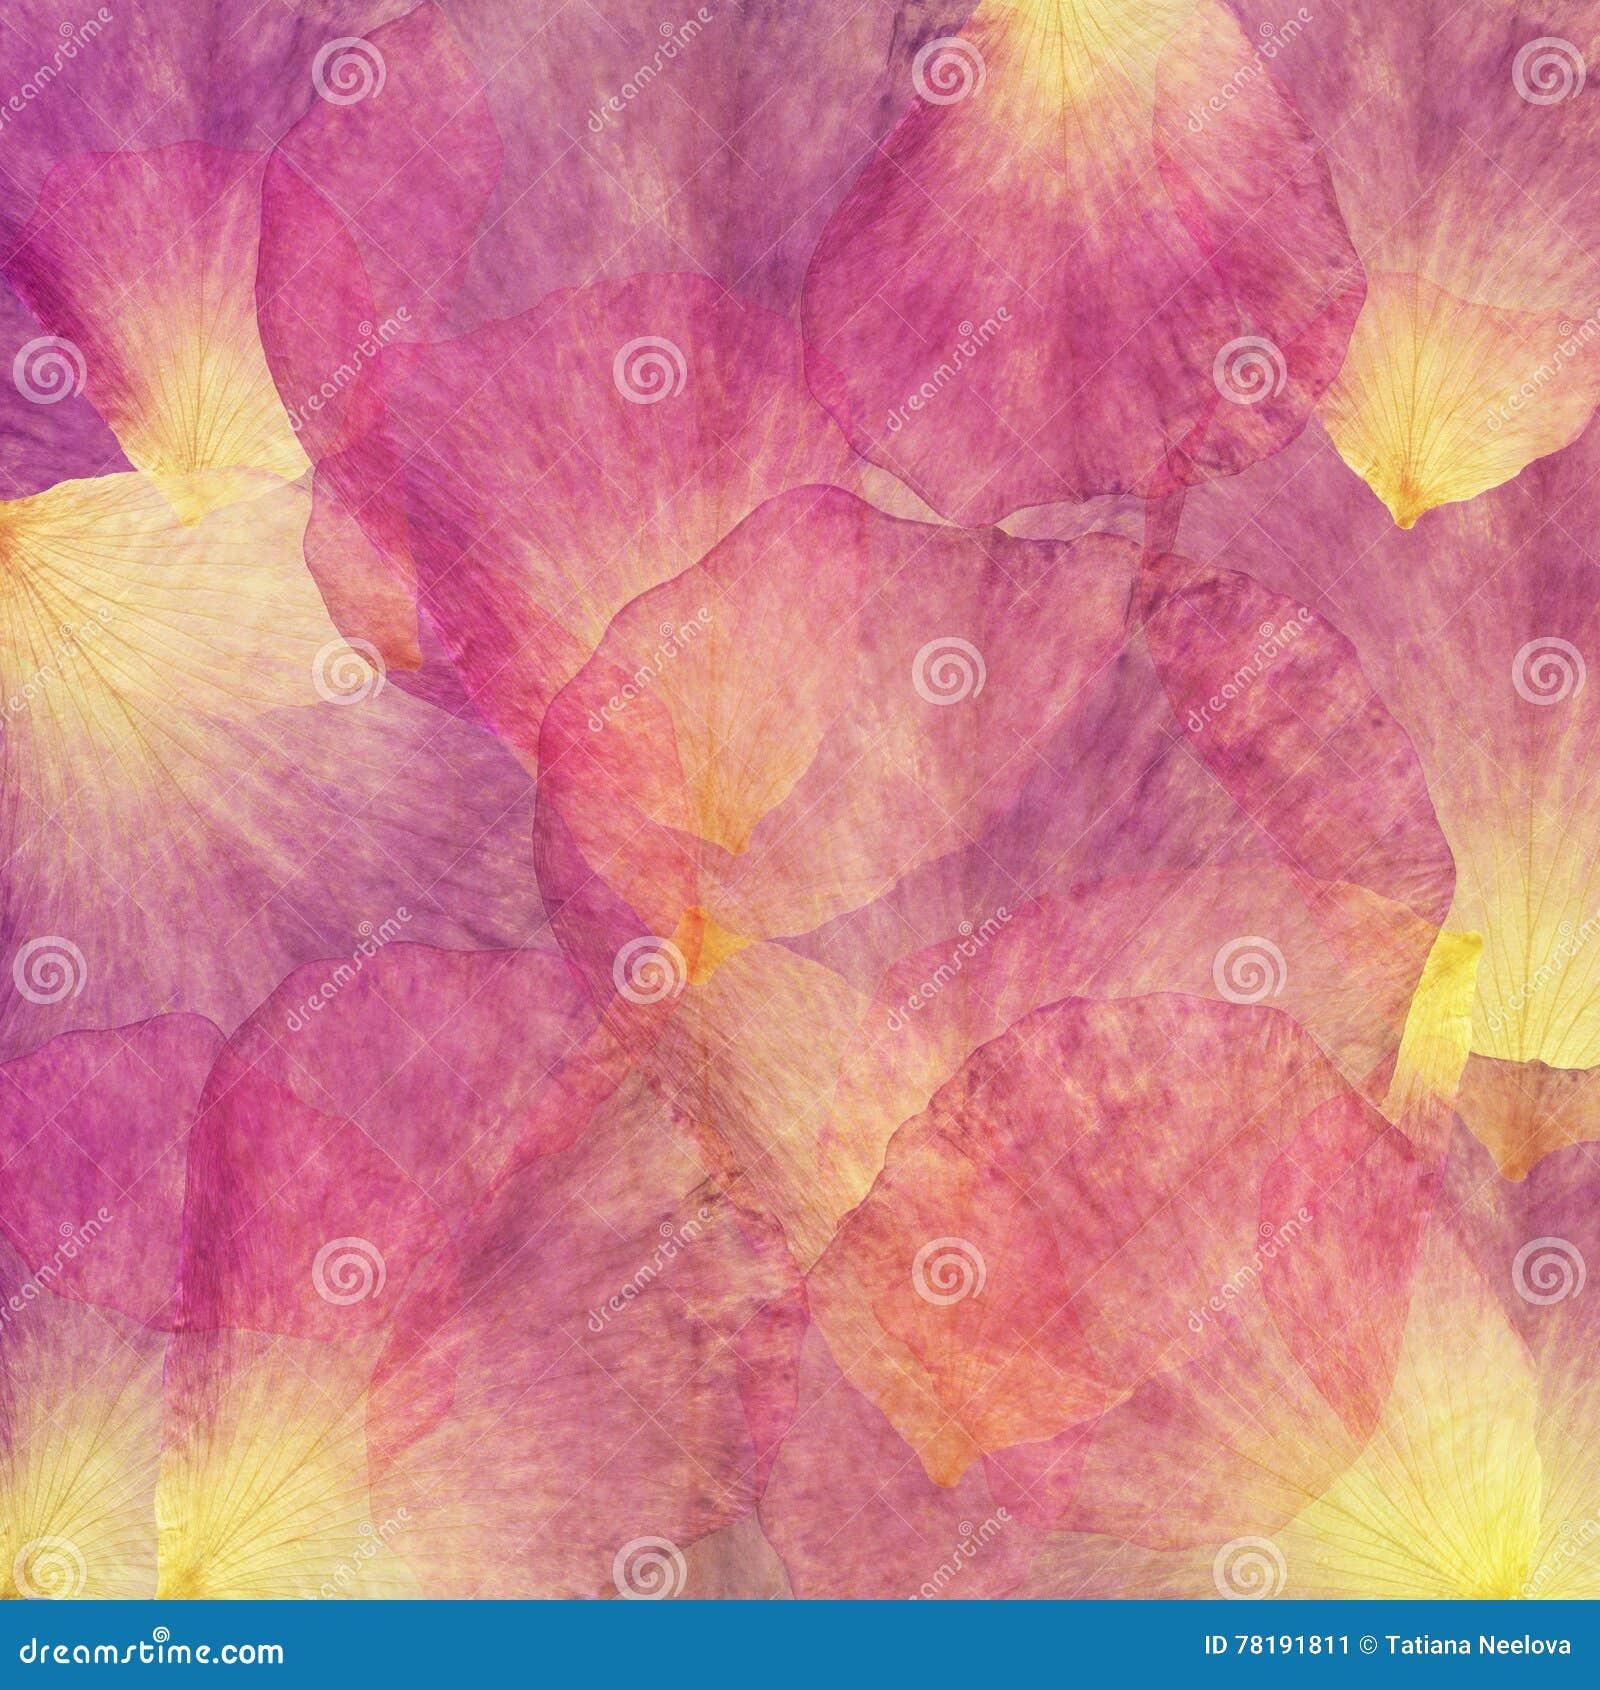 Batik design royalty free stock photos image 29546988 - Floral Art Grunge Batik Background Stylization Pastel Colors Watercolors Vintage Textured Backdrop With